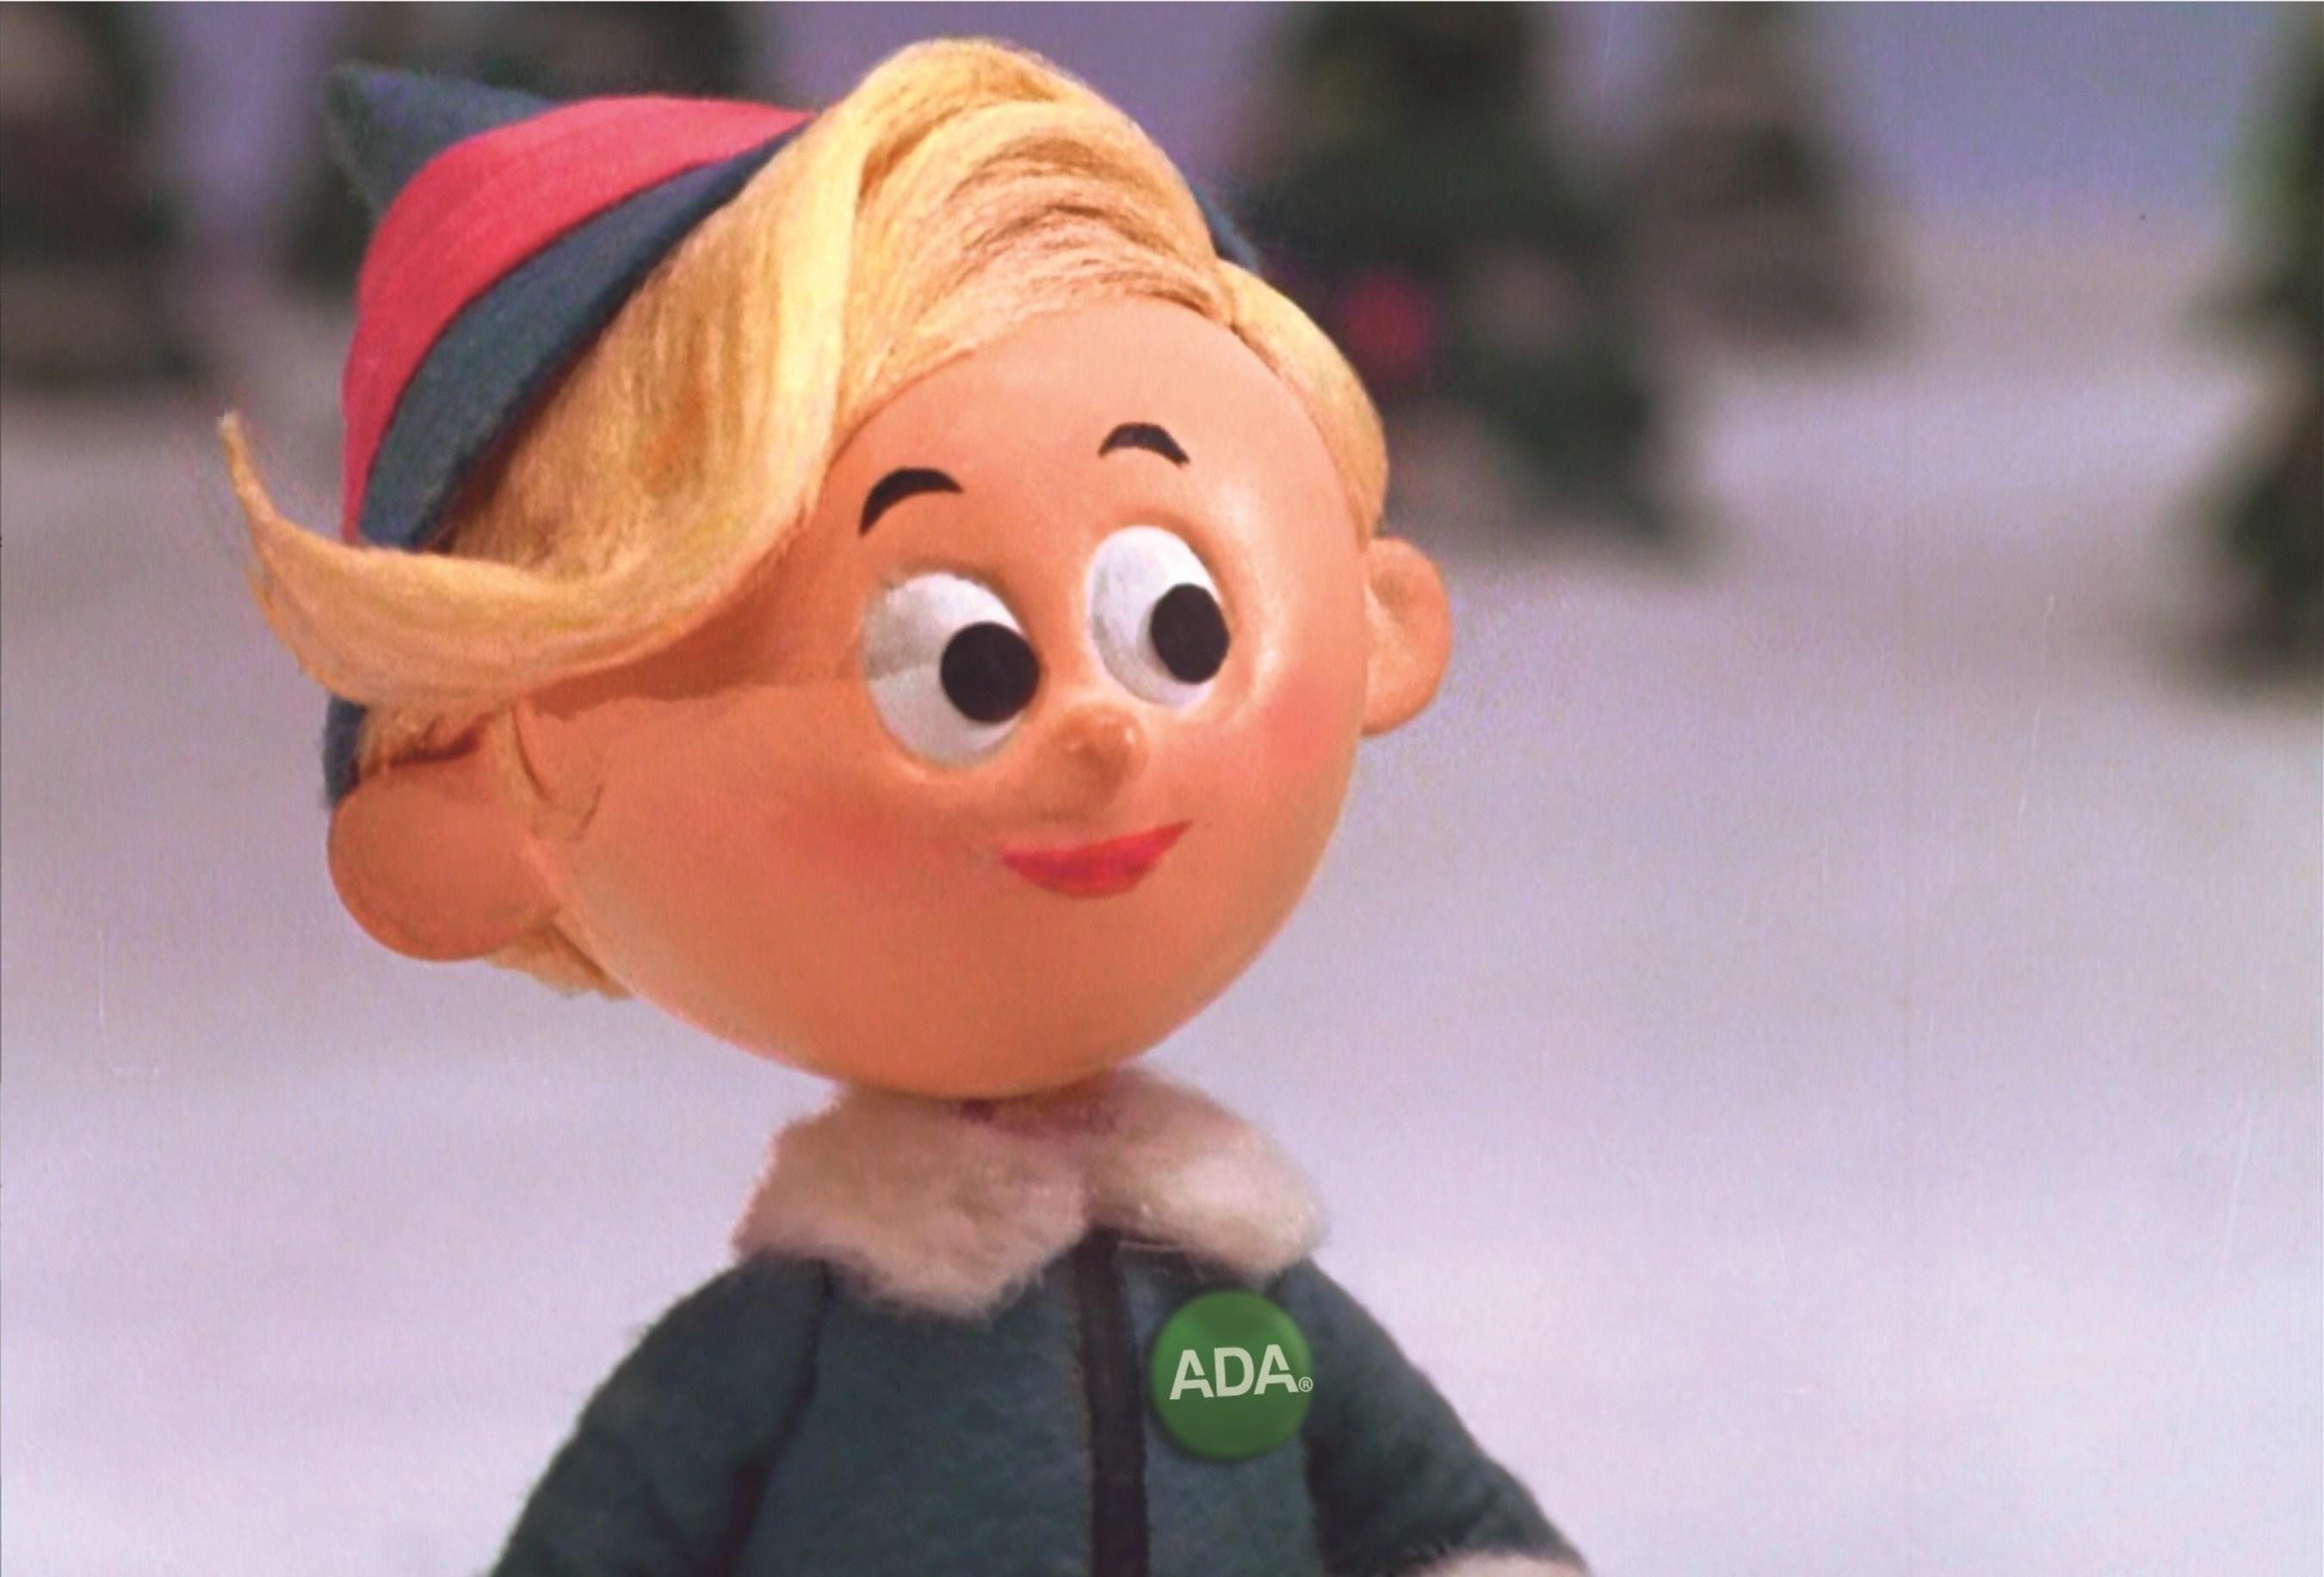 Hermey the Elf, D.D.G. (Dental Do Gooder)